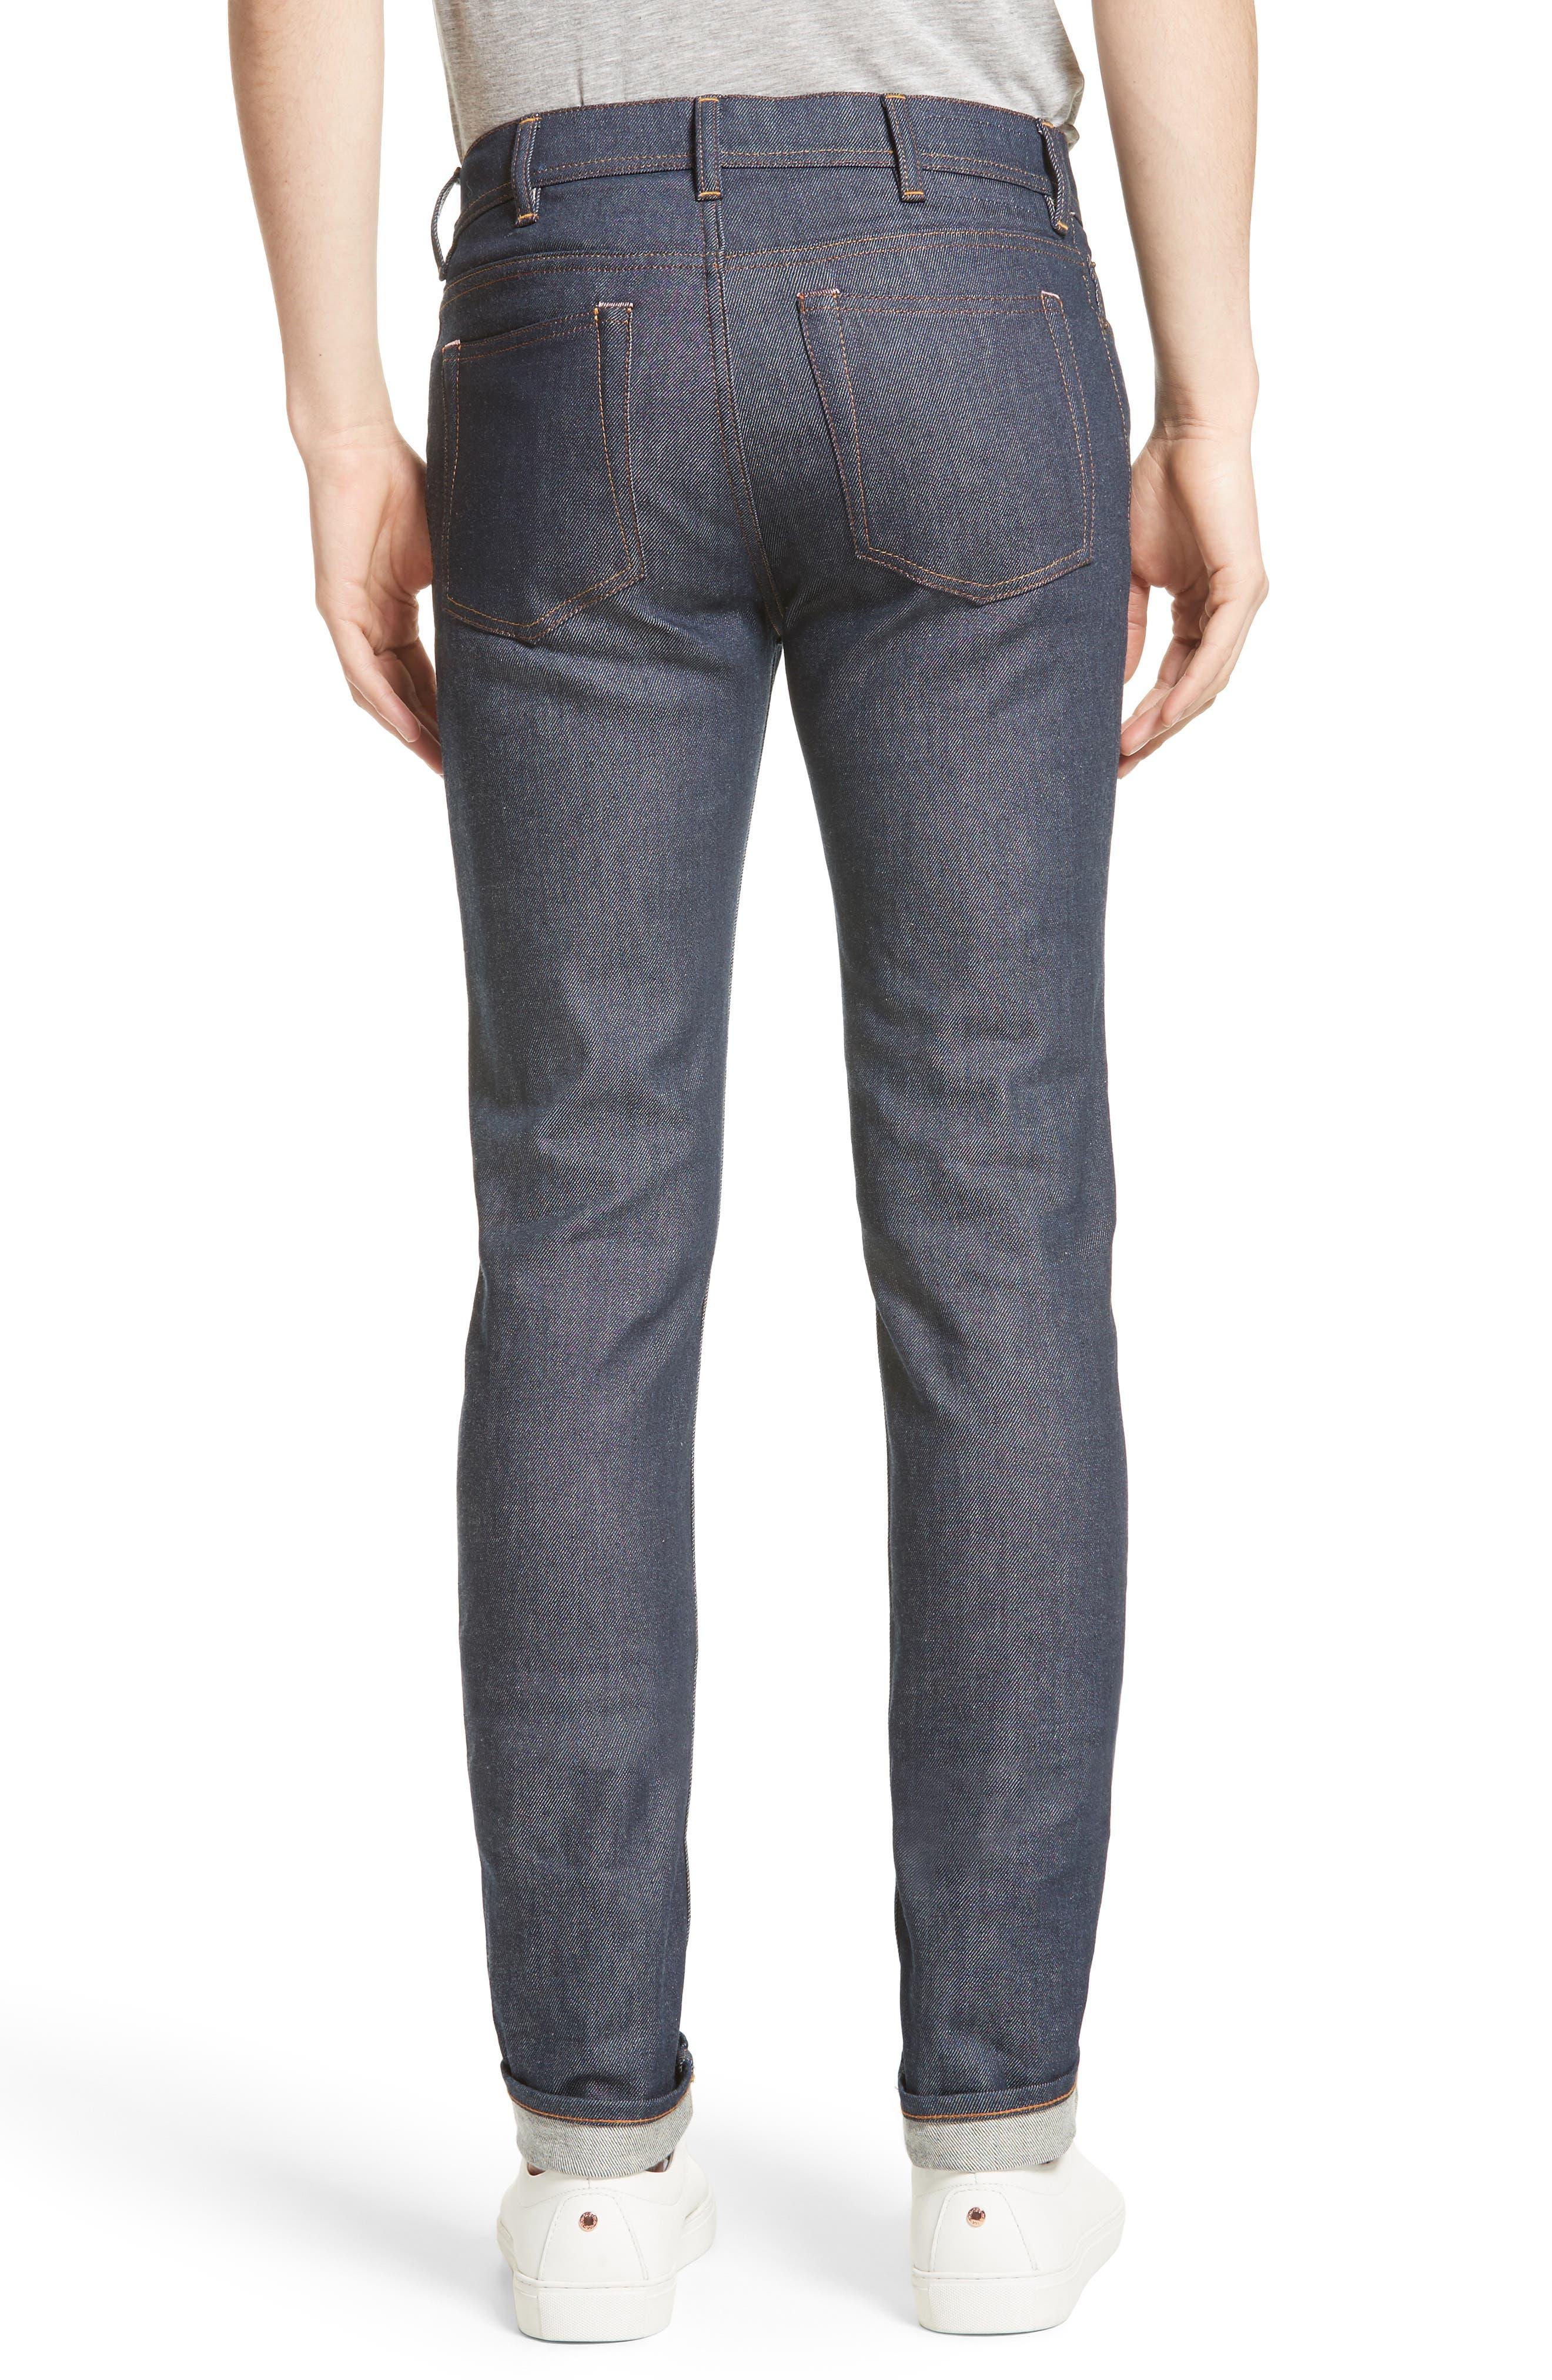 North Skinny Jeans,                             Alternate thumbnail 2, color,                             INDIGO